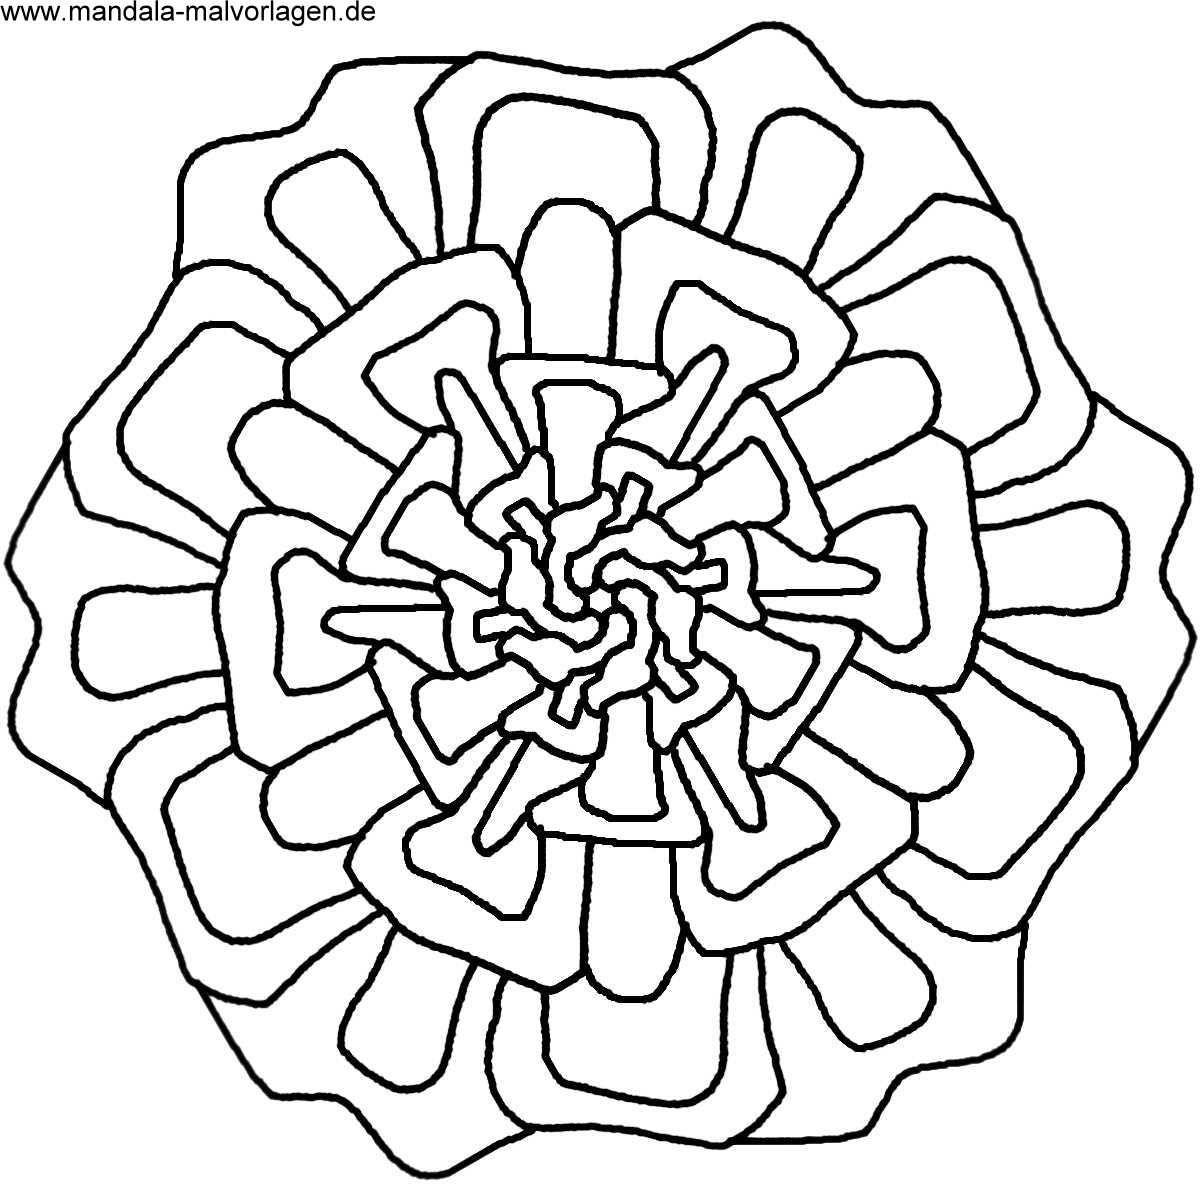 Mandalas zum ausdrucken  Mandala Malvorlagen  Mandala zum malen